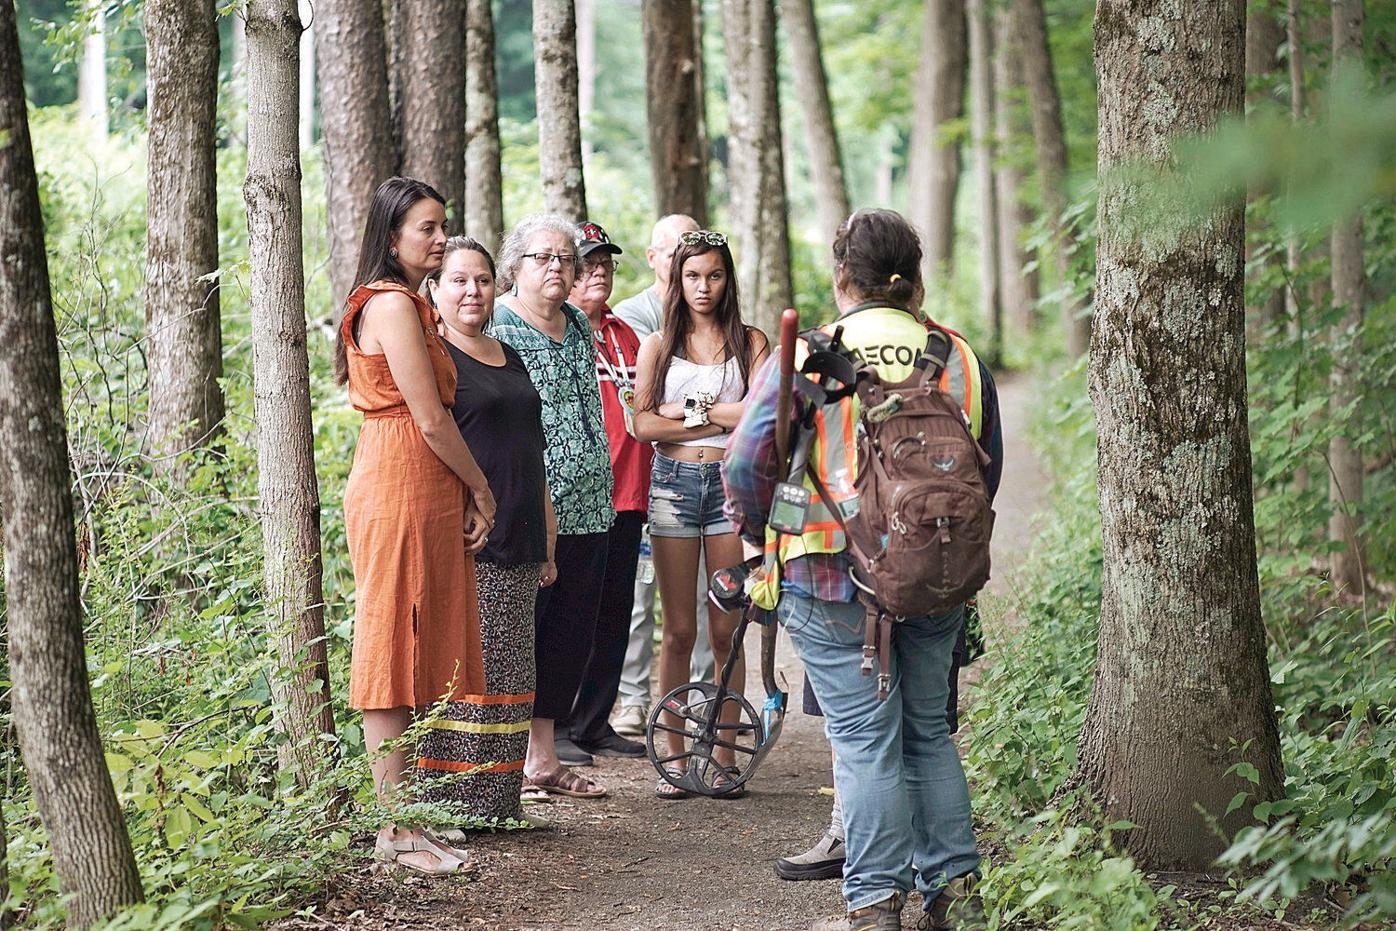 For Stockbridge-Munsee members, return to ancestral homeland 'very humbling'